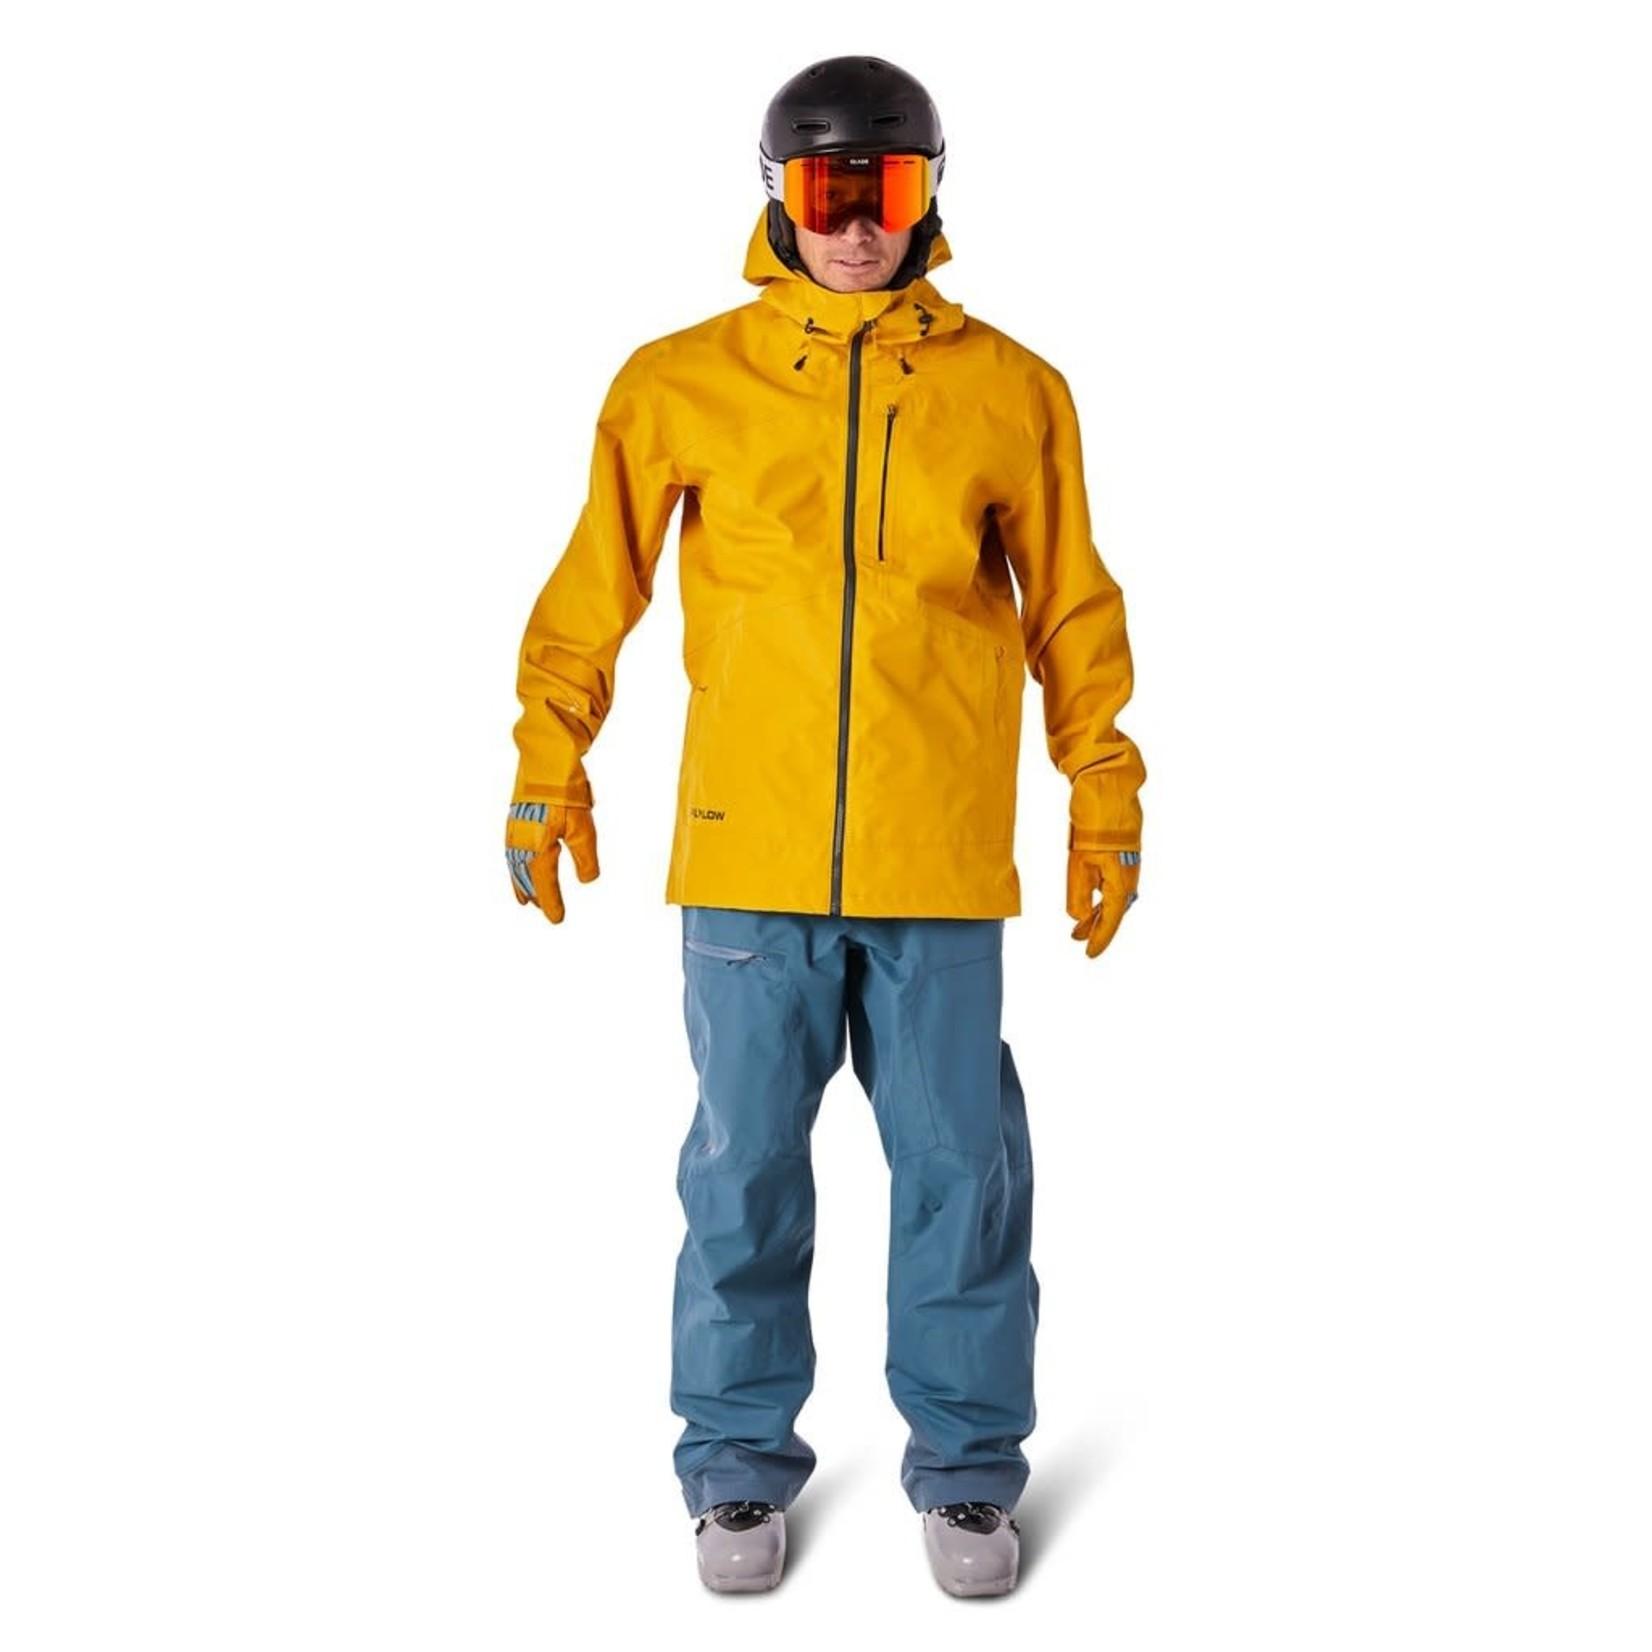 Flylow Pantalon de ski Flylow Cage - Homme